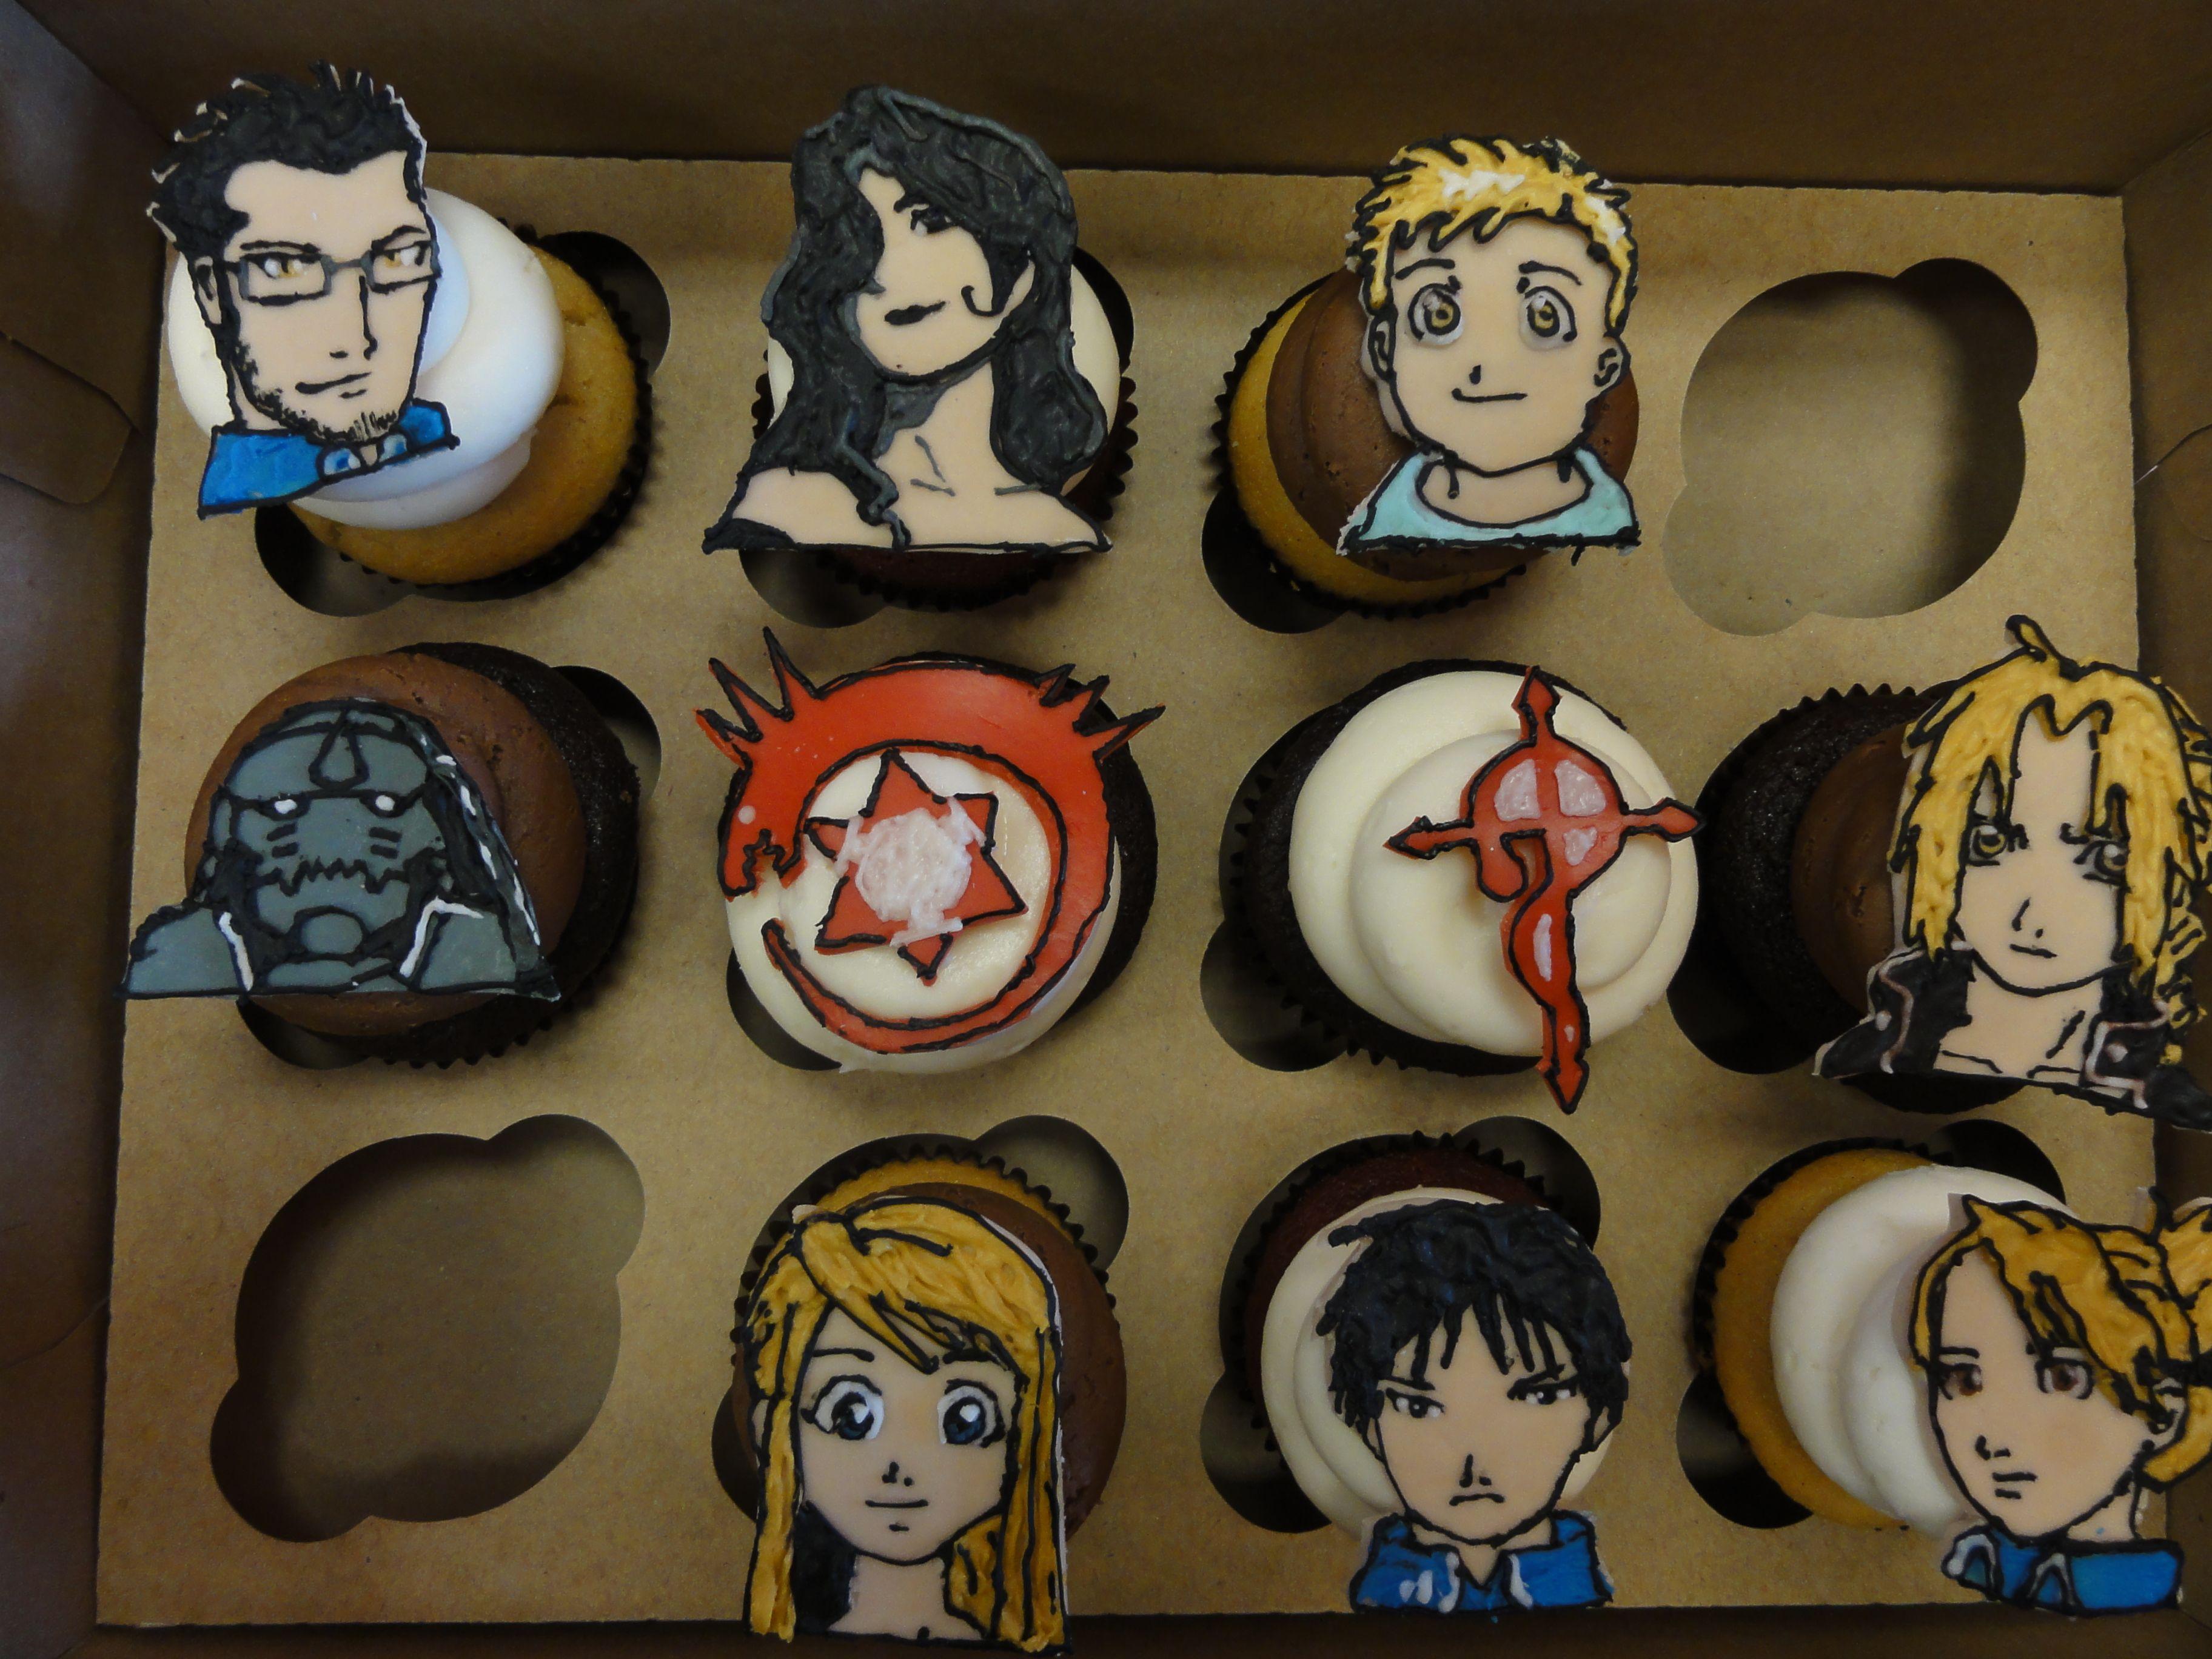 Fullmetal Alchemist Cupcakes by Frostings Bake Shop